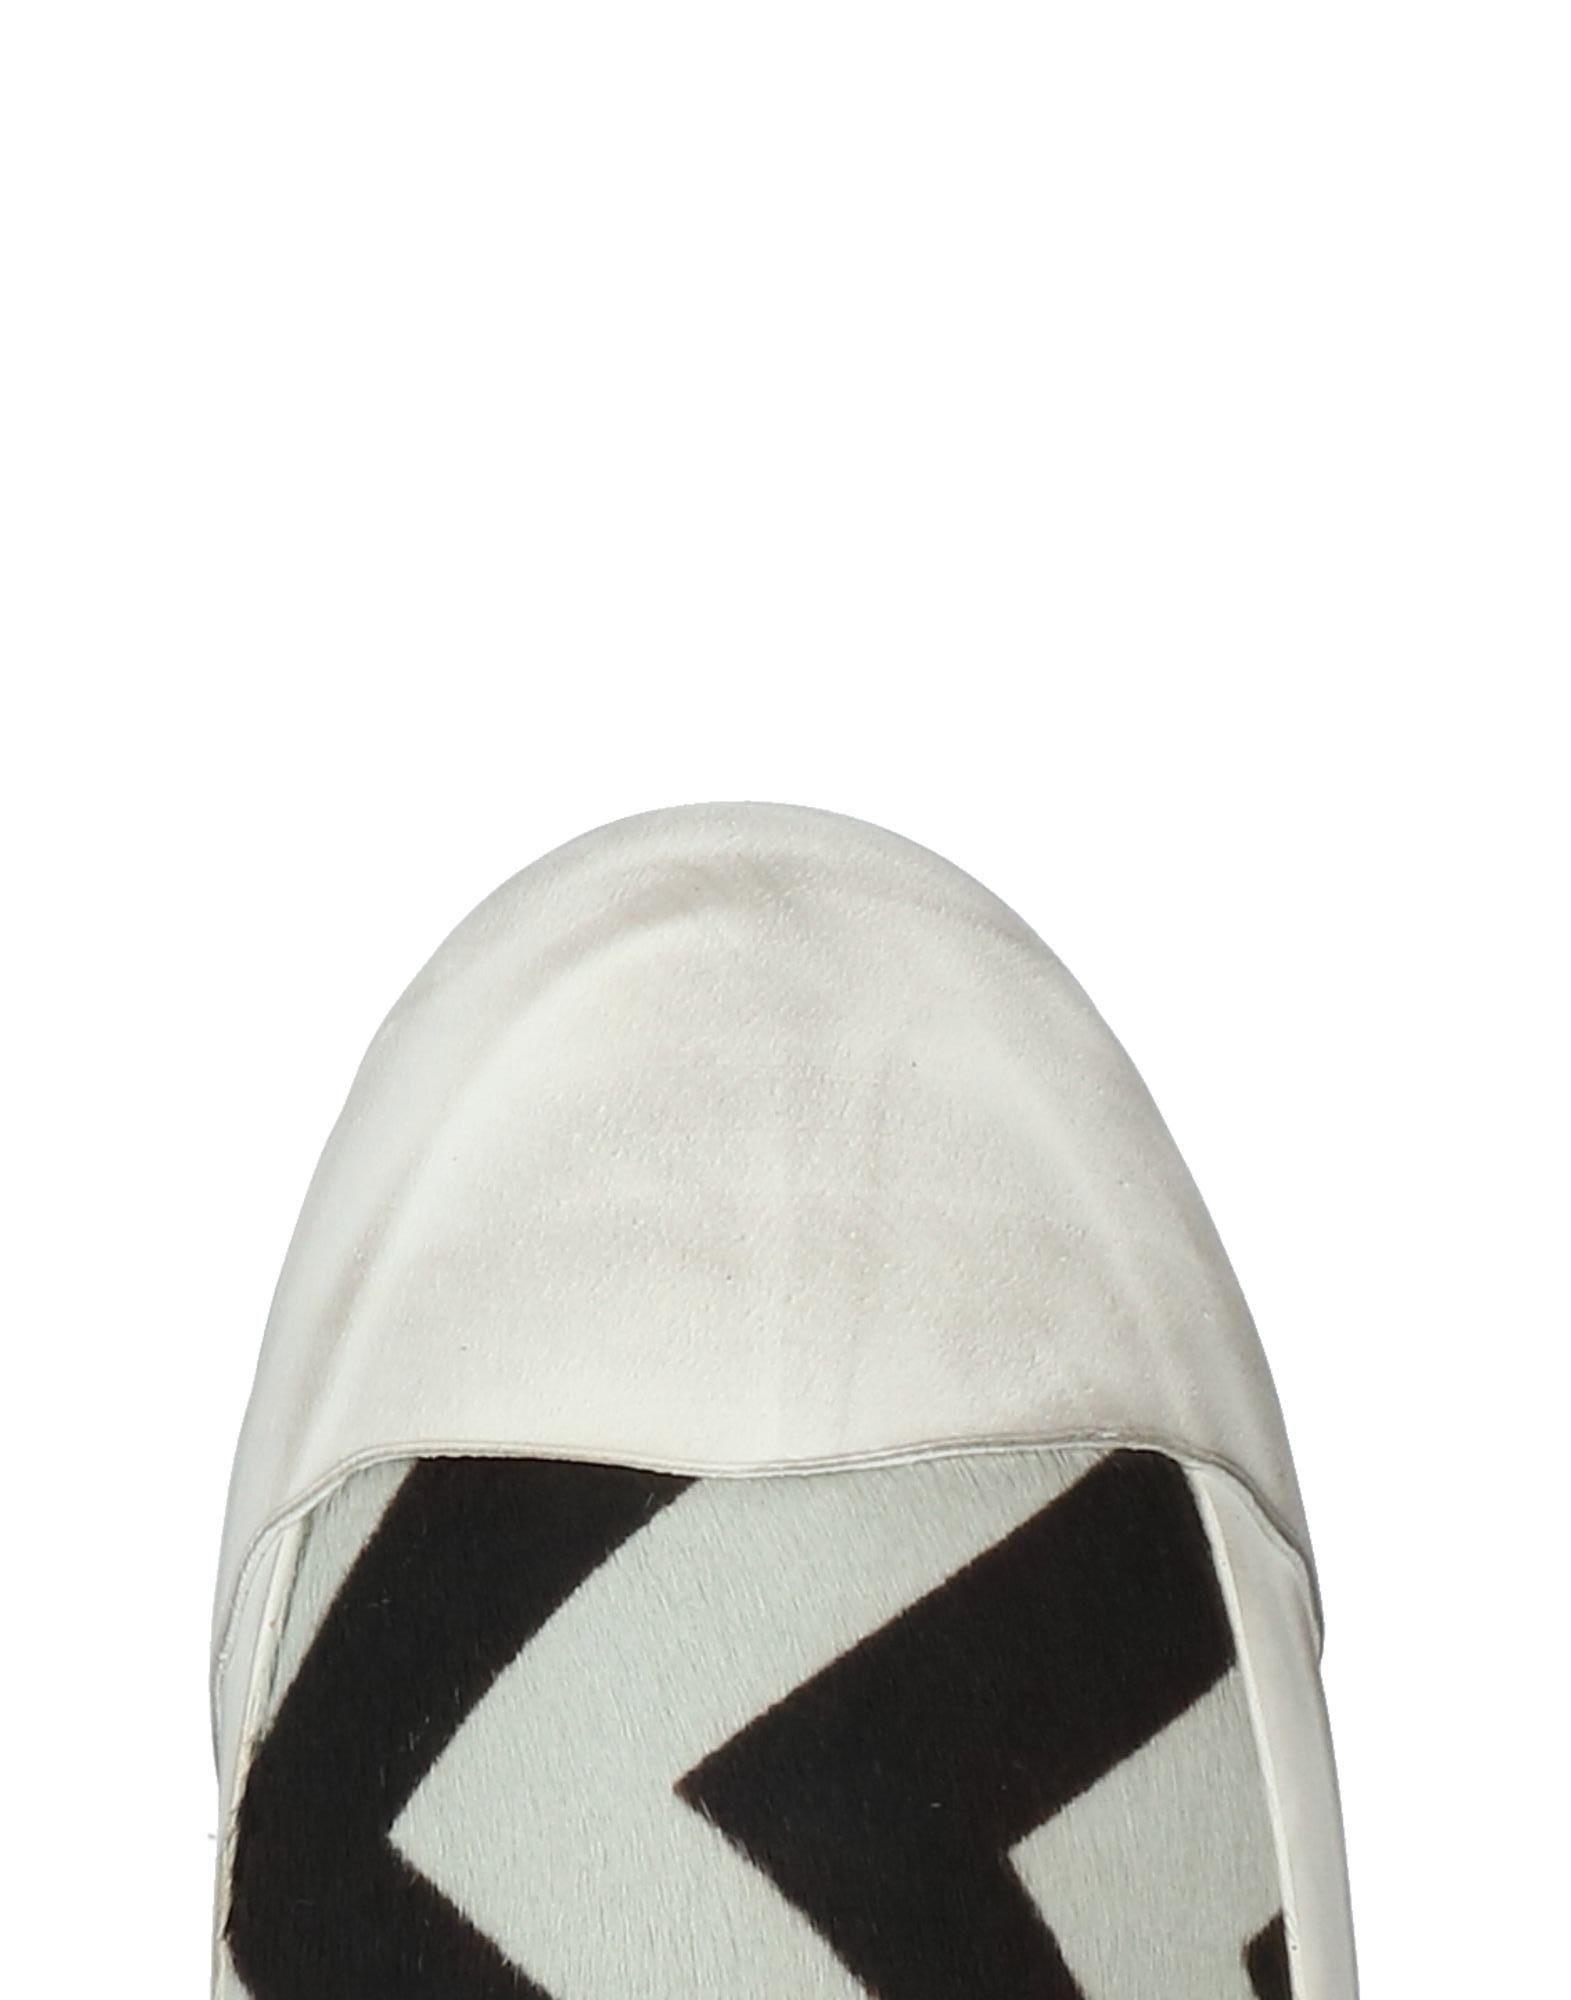 O.X.S. Sneakers Gute Damen  11338966HU Gute Sneakers Qualität beliebte Schuhe c7e904